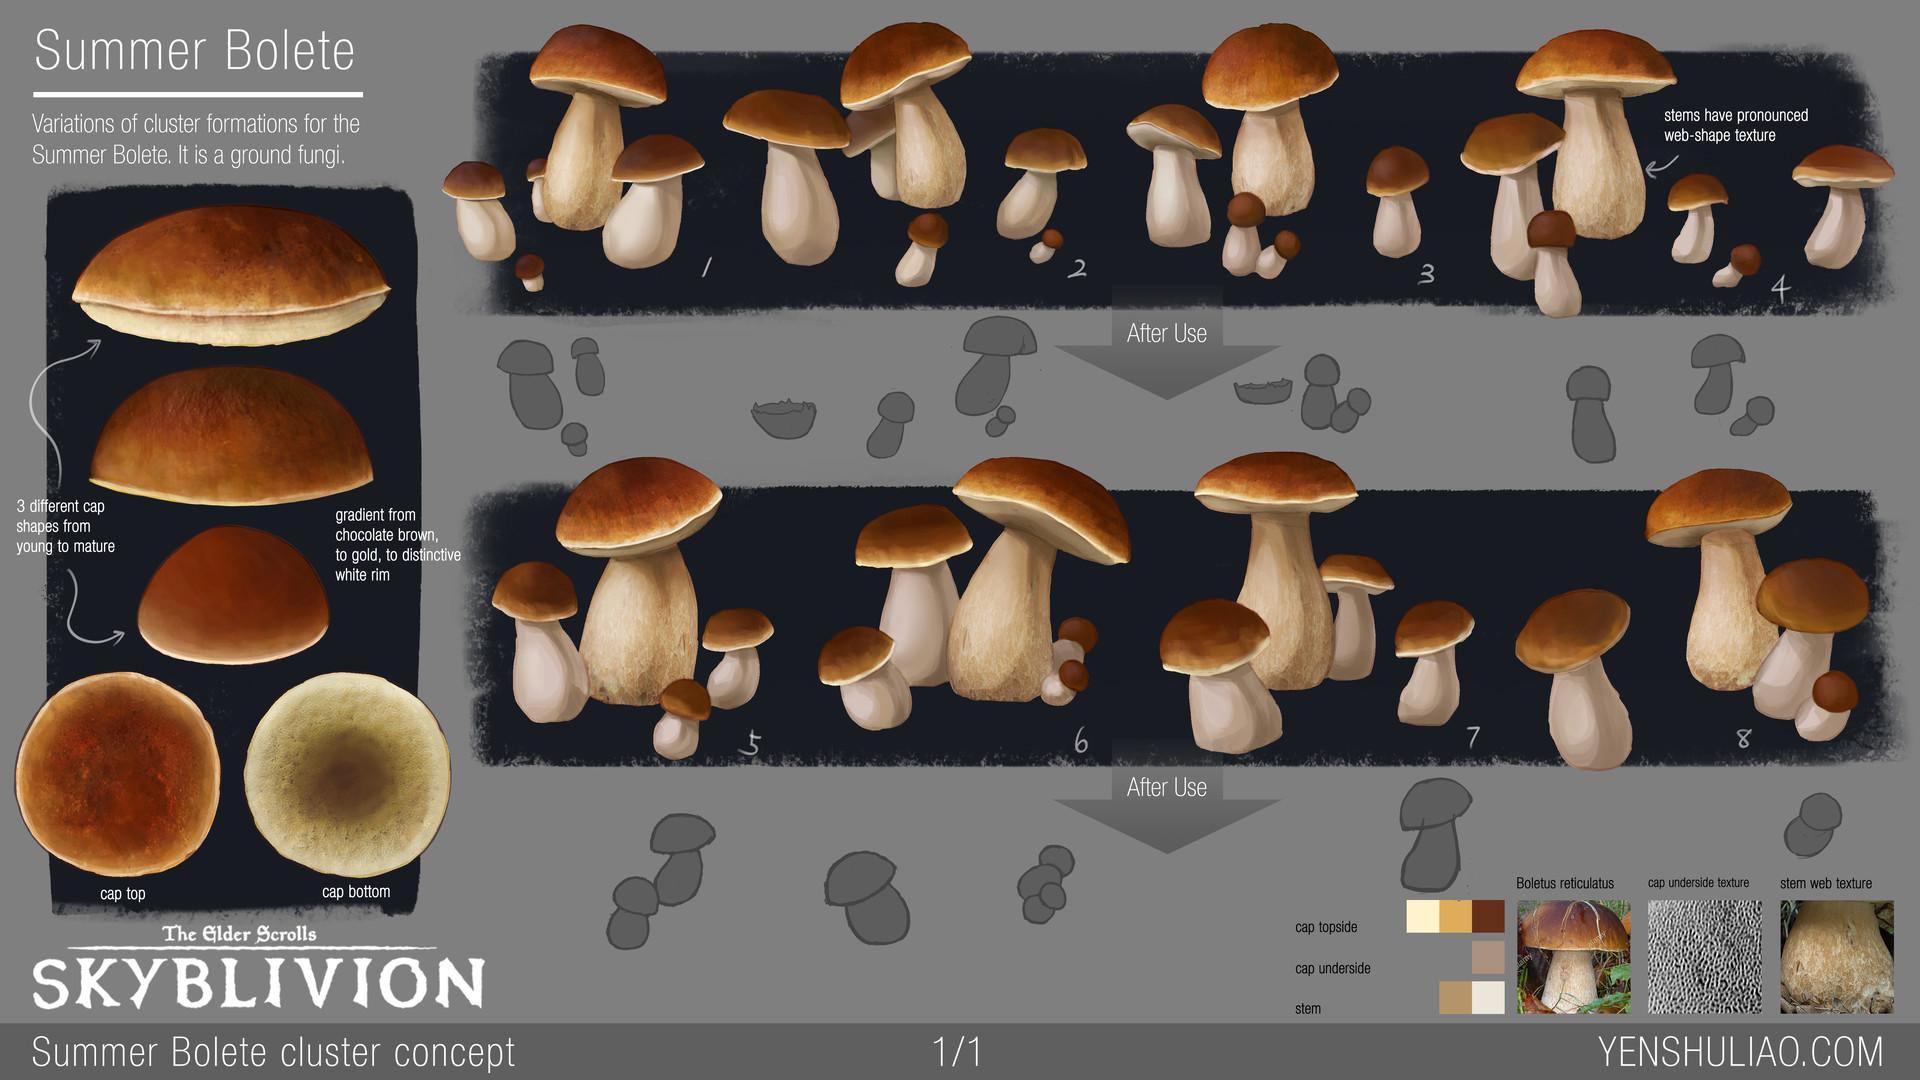 Yen shu liao mushroom environment prop concept yen shu liao skyblivion summerbolete